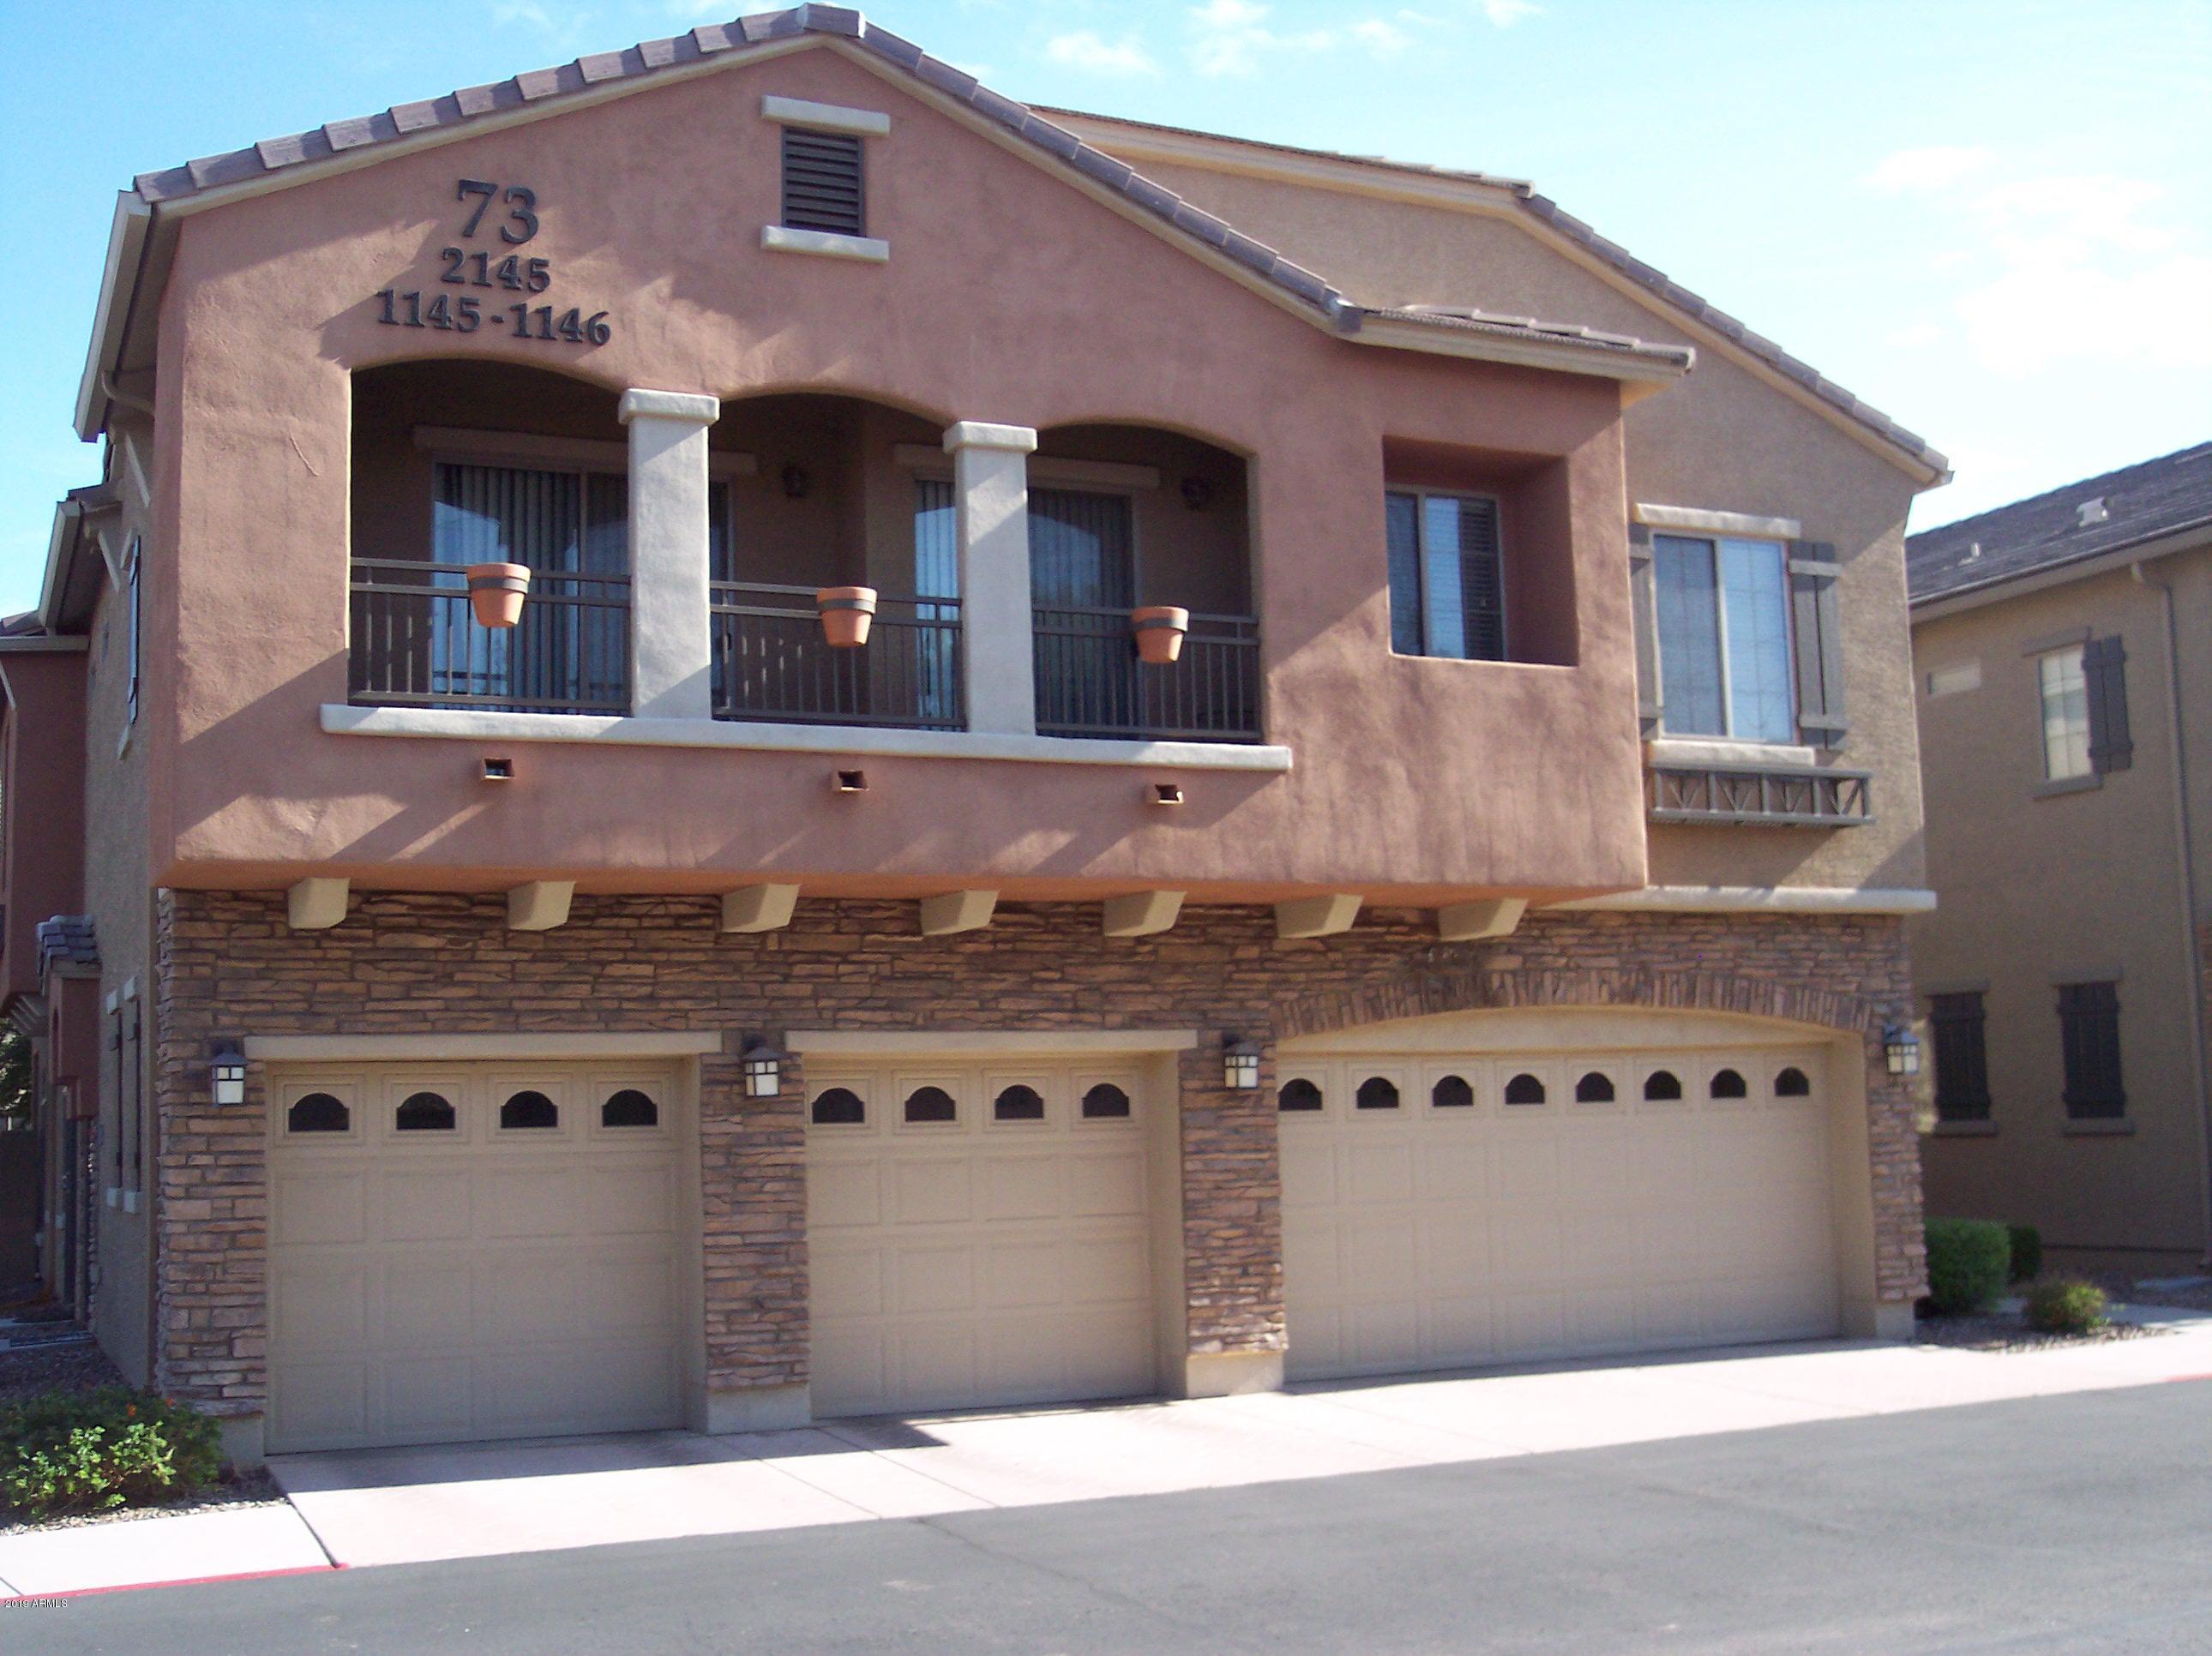 Photo of 1350 S GREENFIELD Road #1146, Mesa, AZ 85206